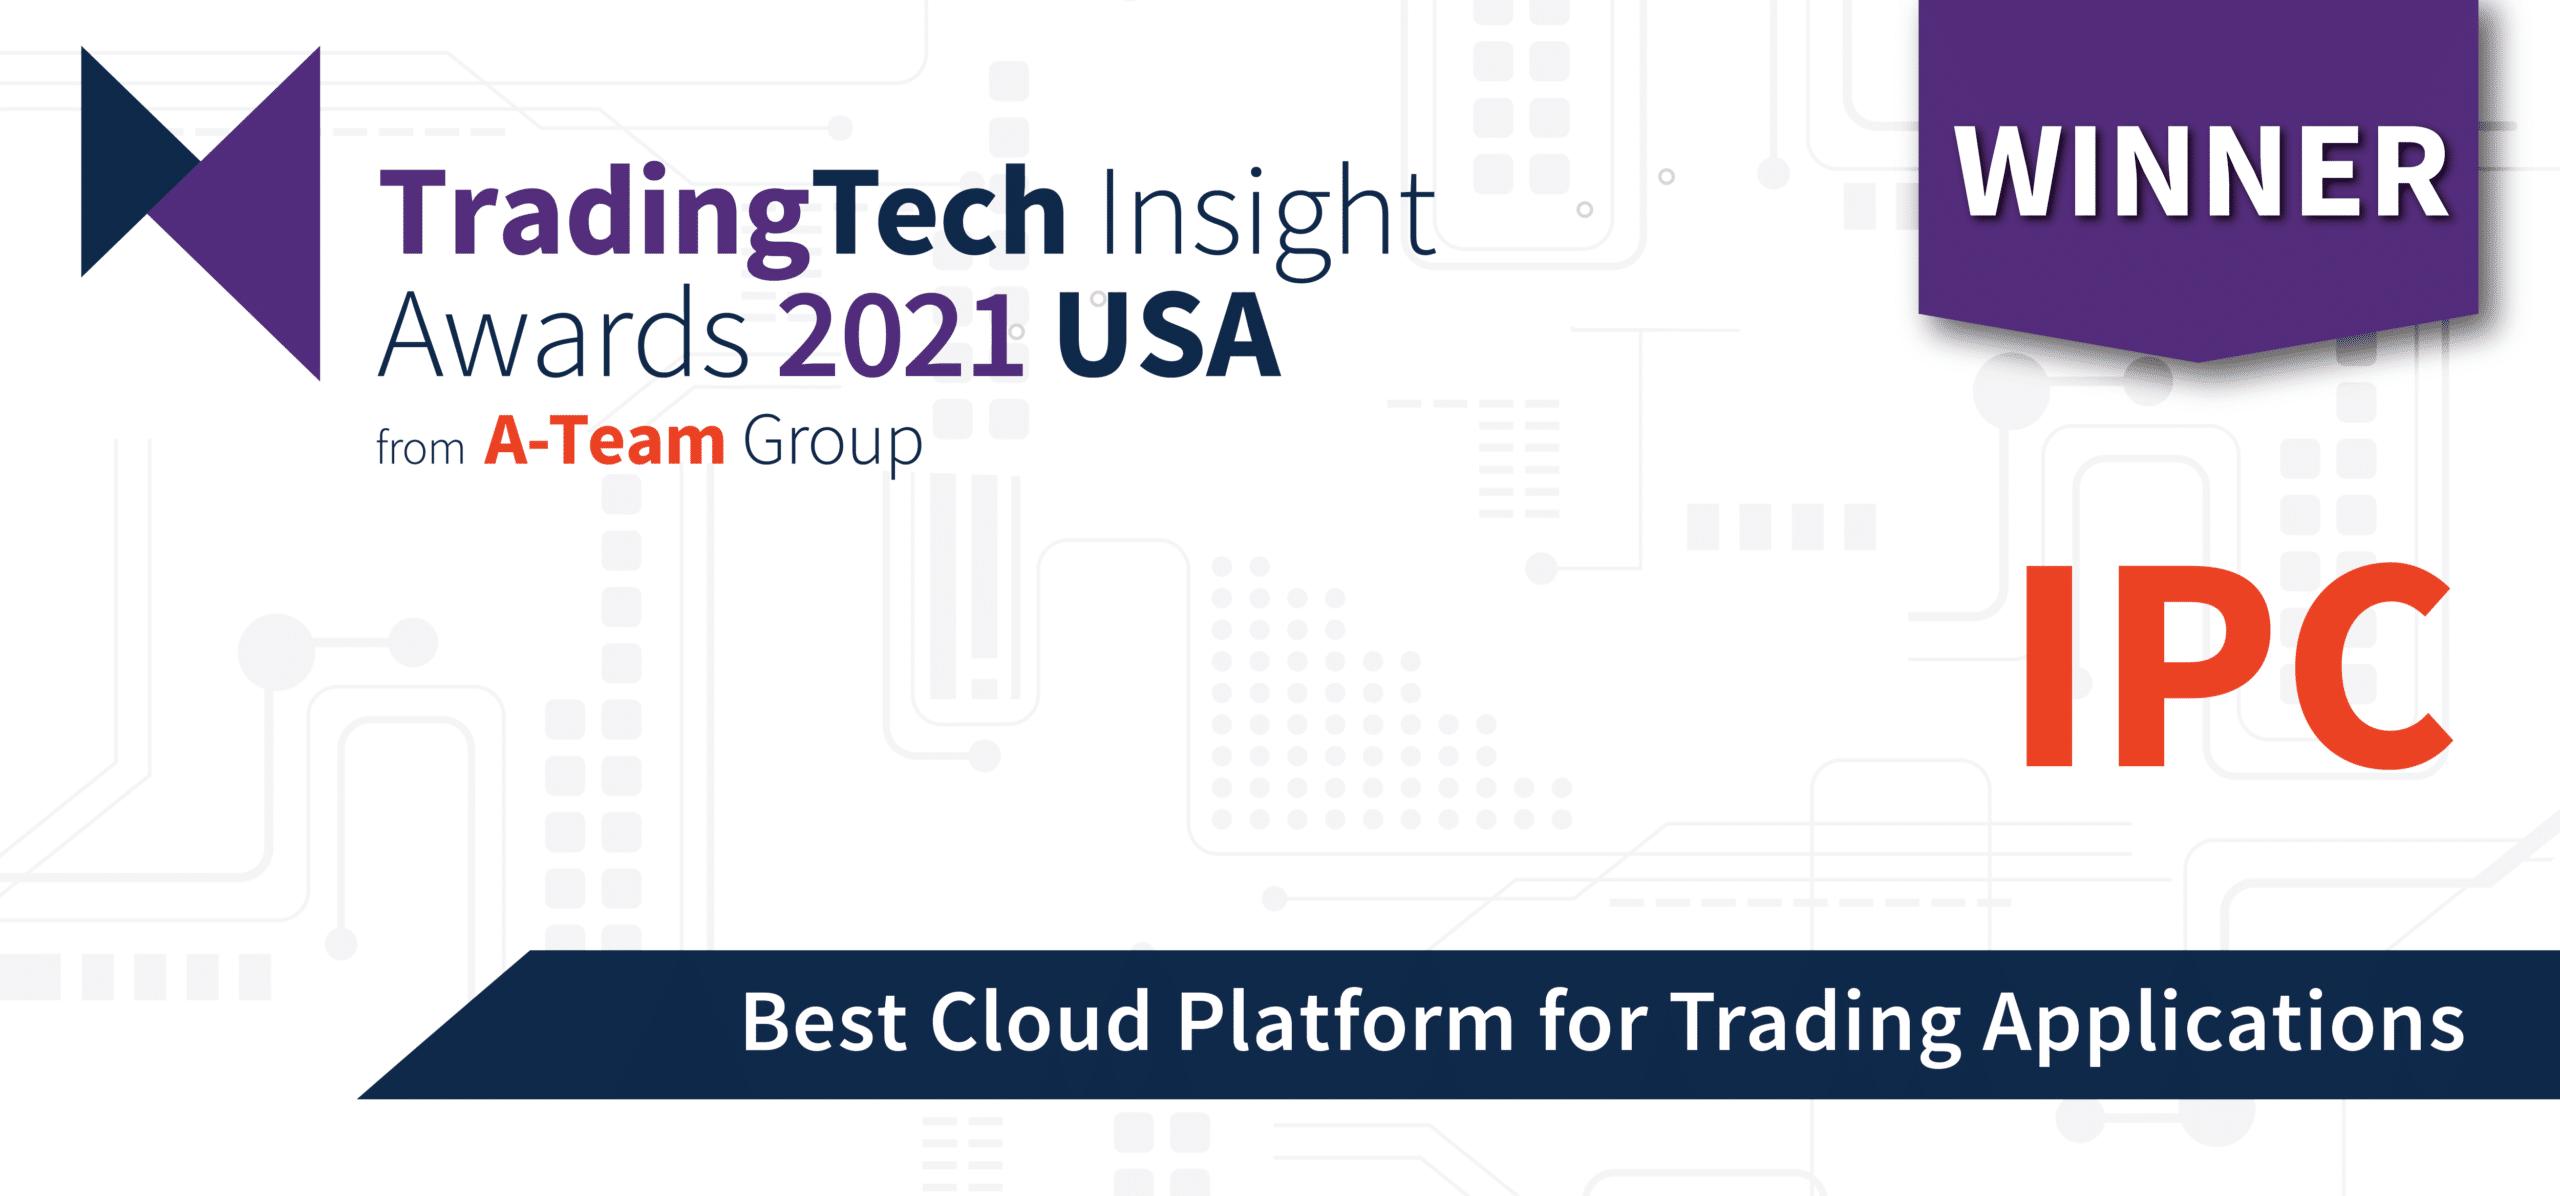 """Best Cloud Platform for Trading Applications"" – TradingTech Insight Awards USA 2021"